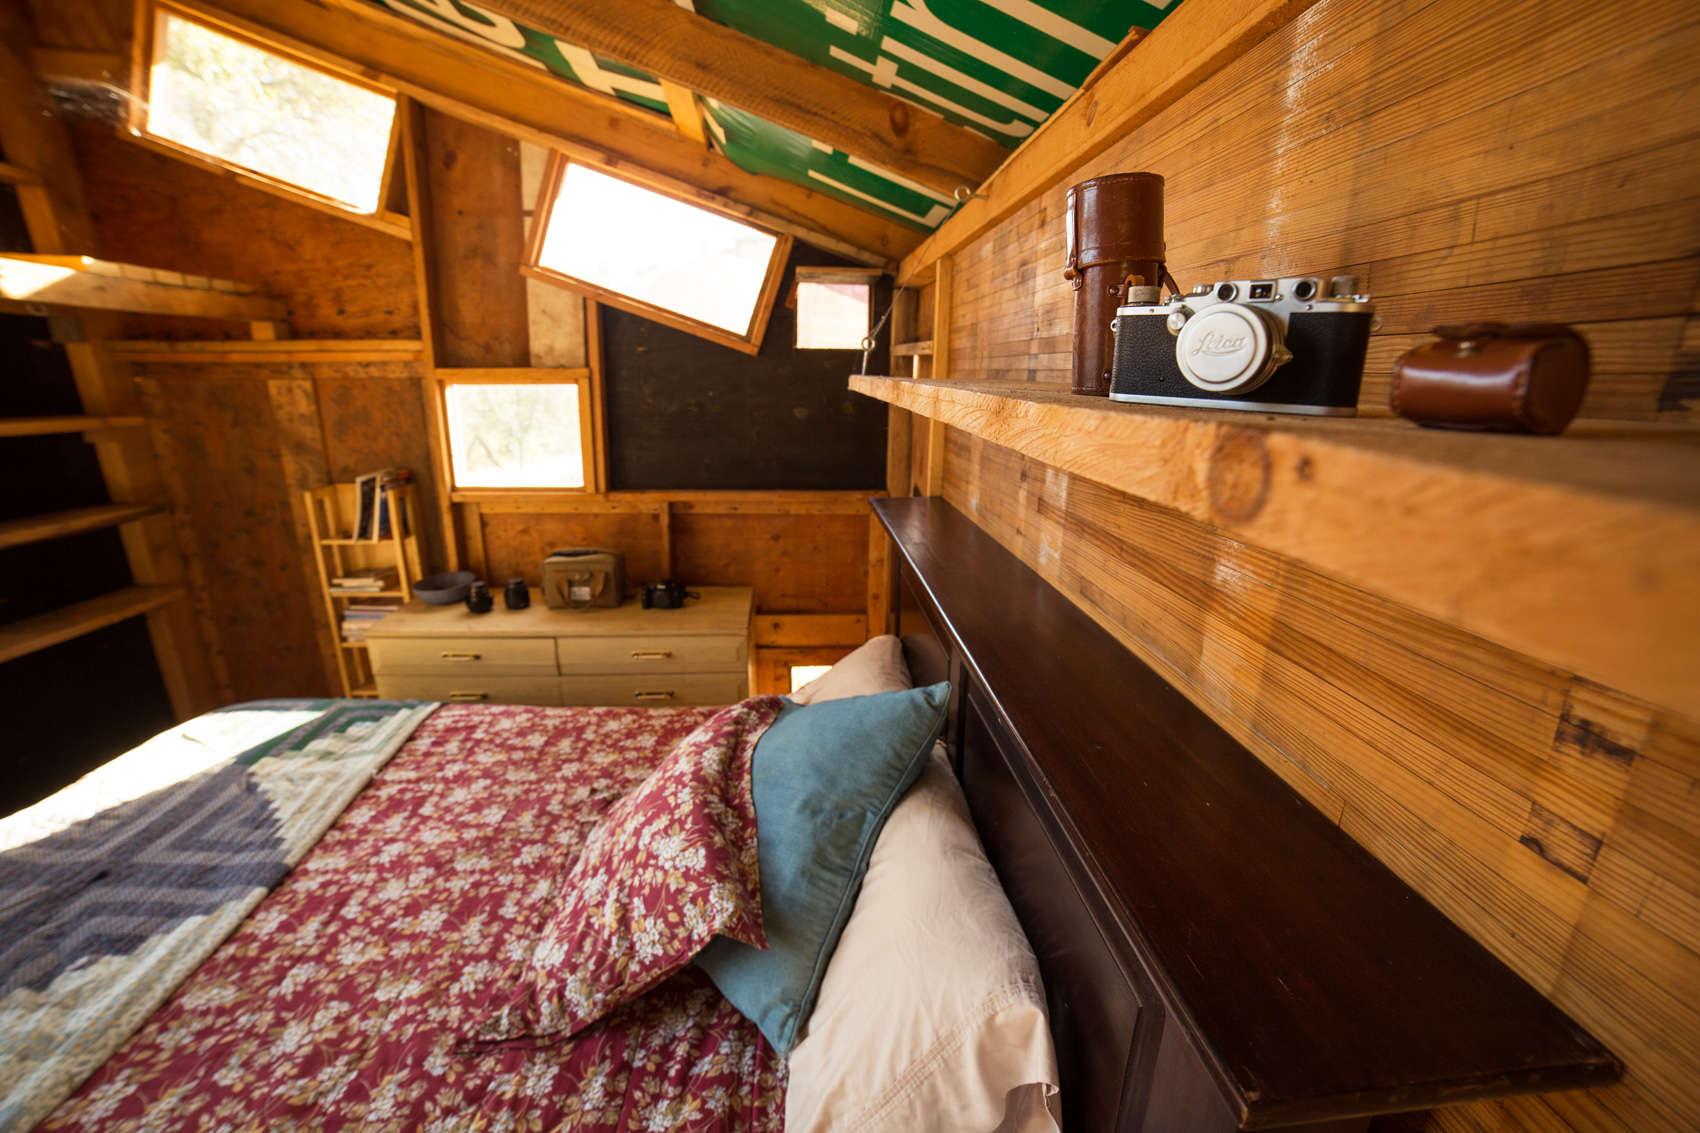 guest cabin wondernut farm ca 37 hipcamper reviews and 79 photos